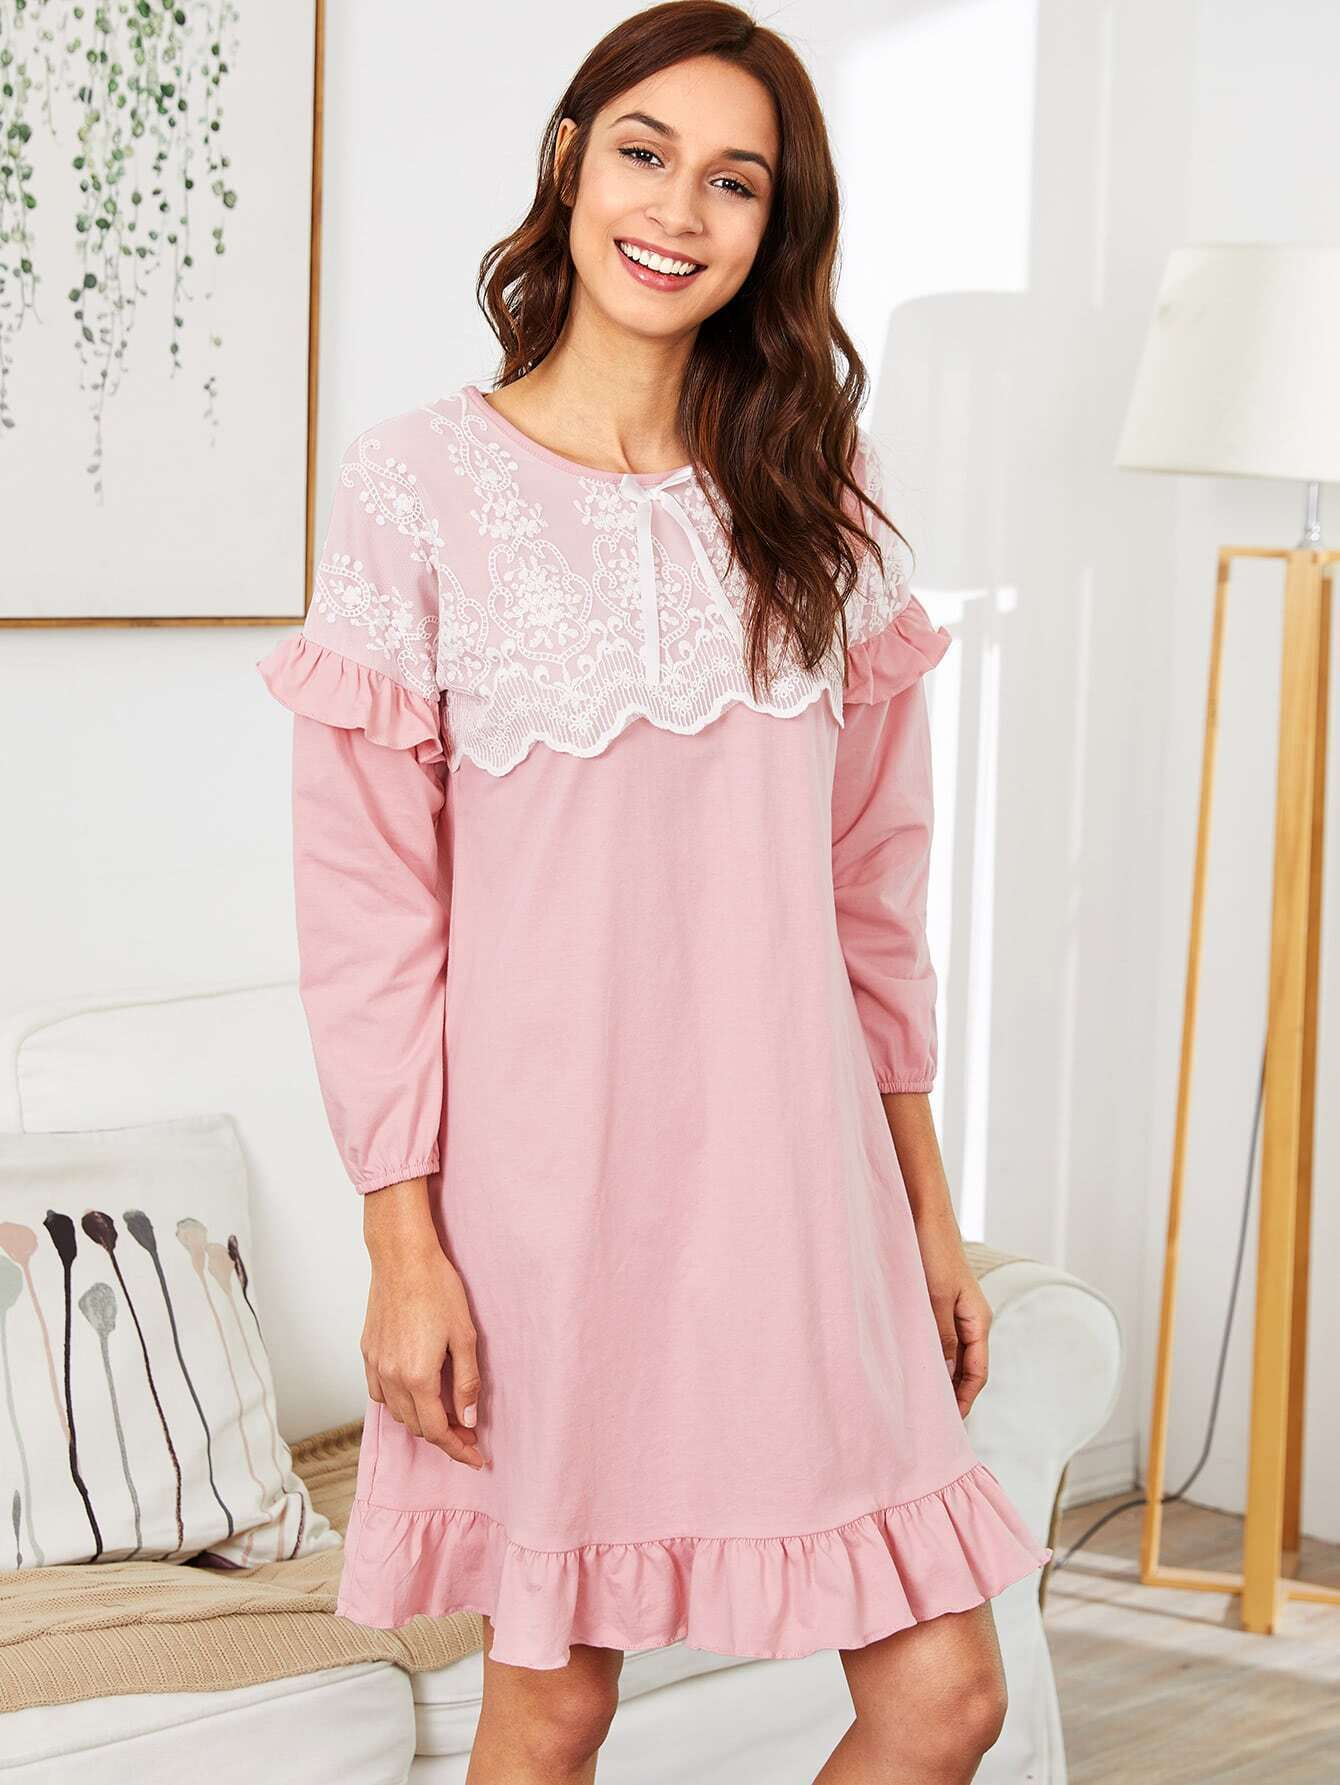 Contrast Lace Ruffle Trim Dress maison jules new junior s small s pink combo lace crepe contrast trim dress $89